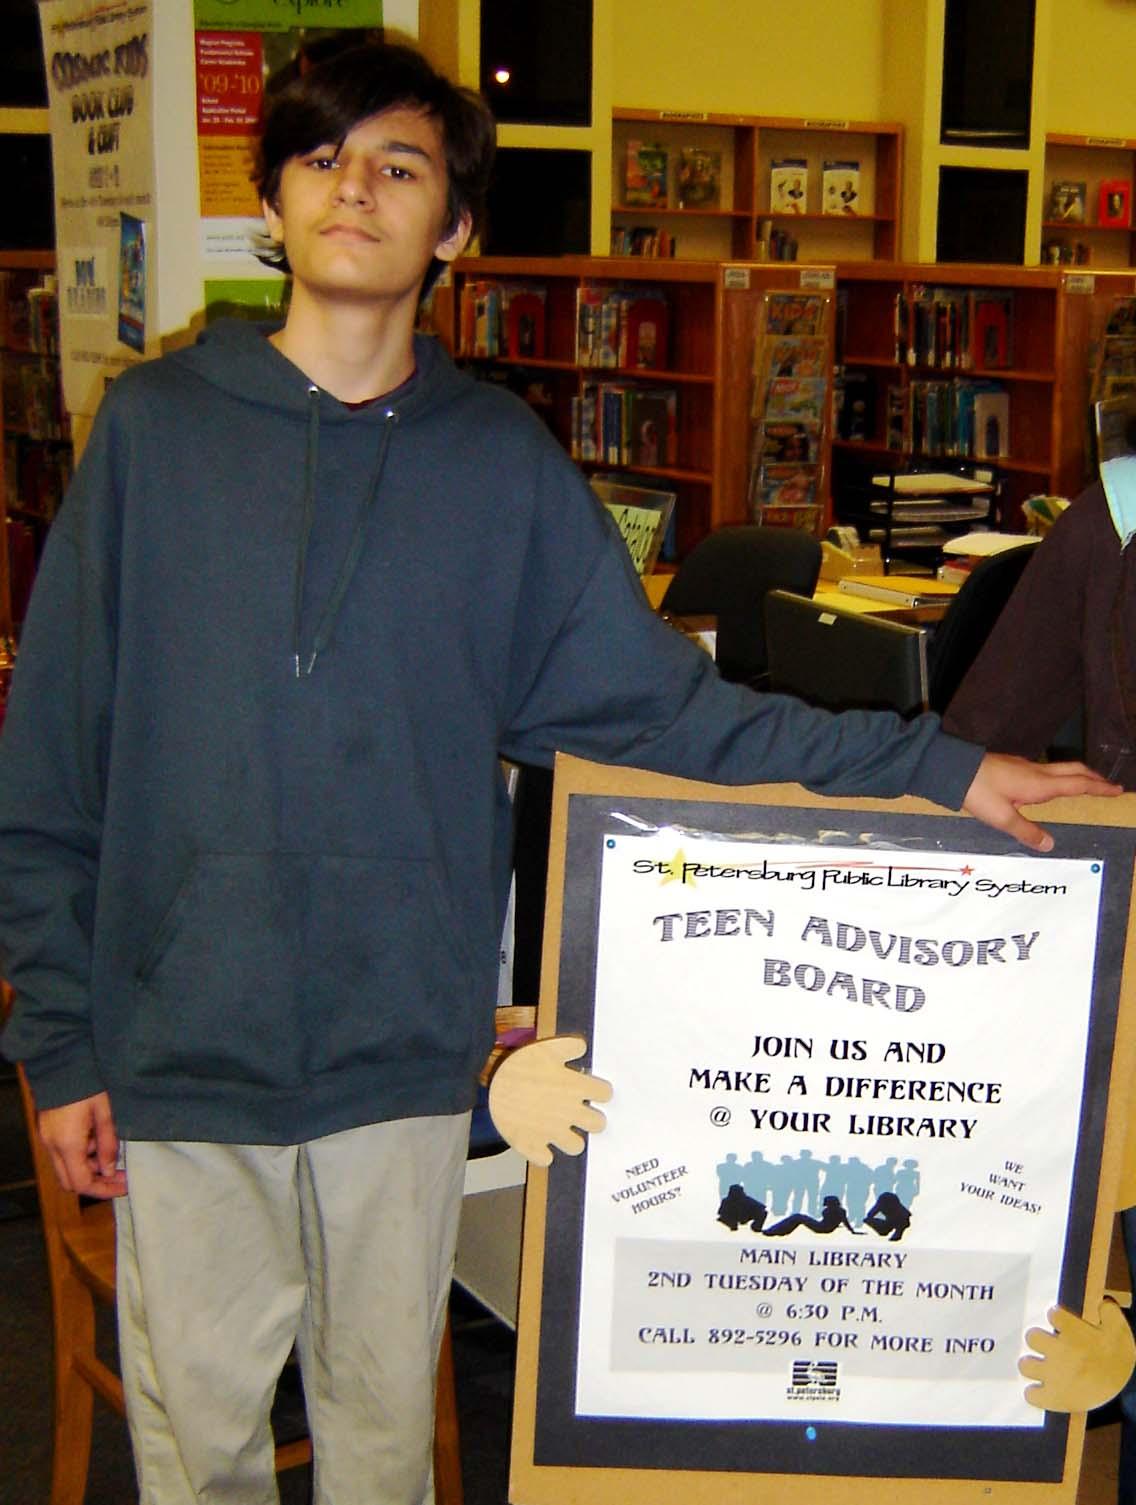 St. Petersburg Library - Teen Advisory Board